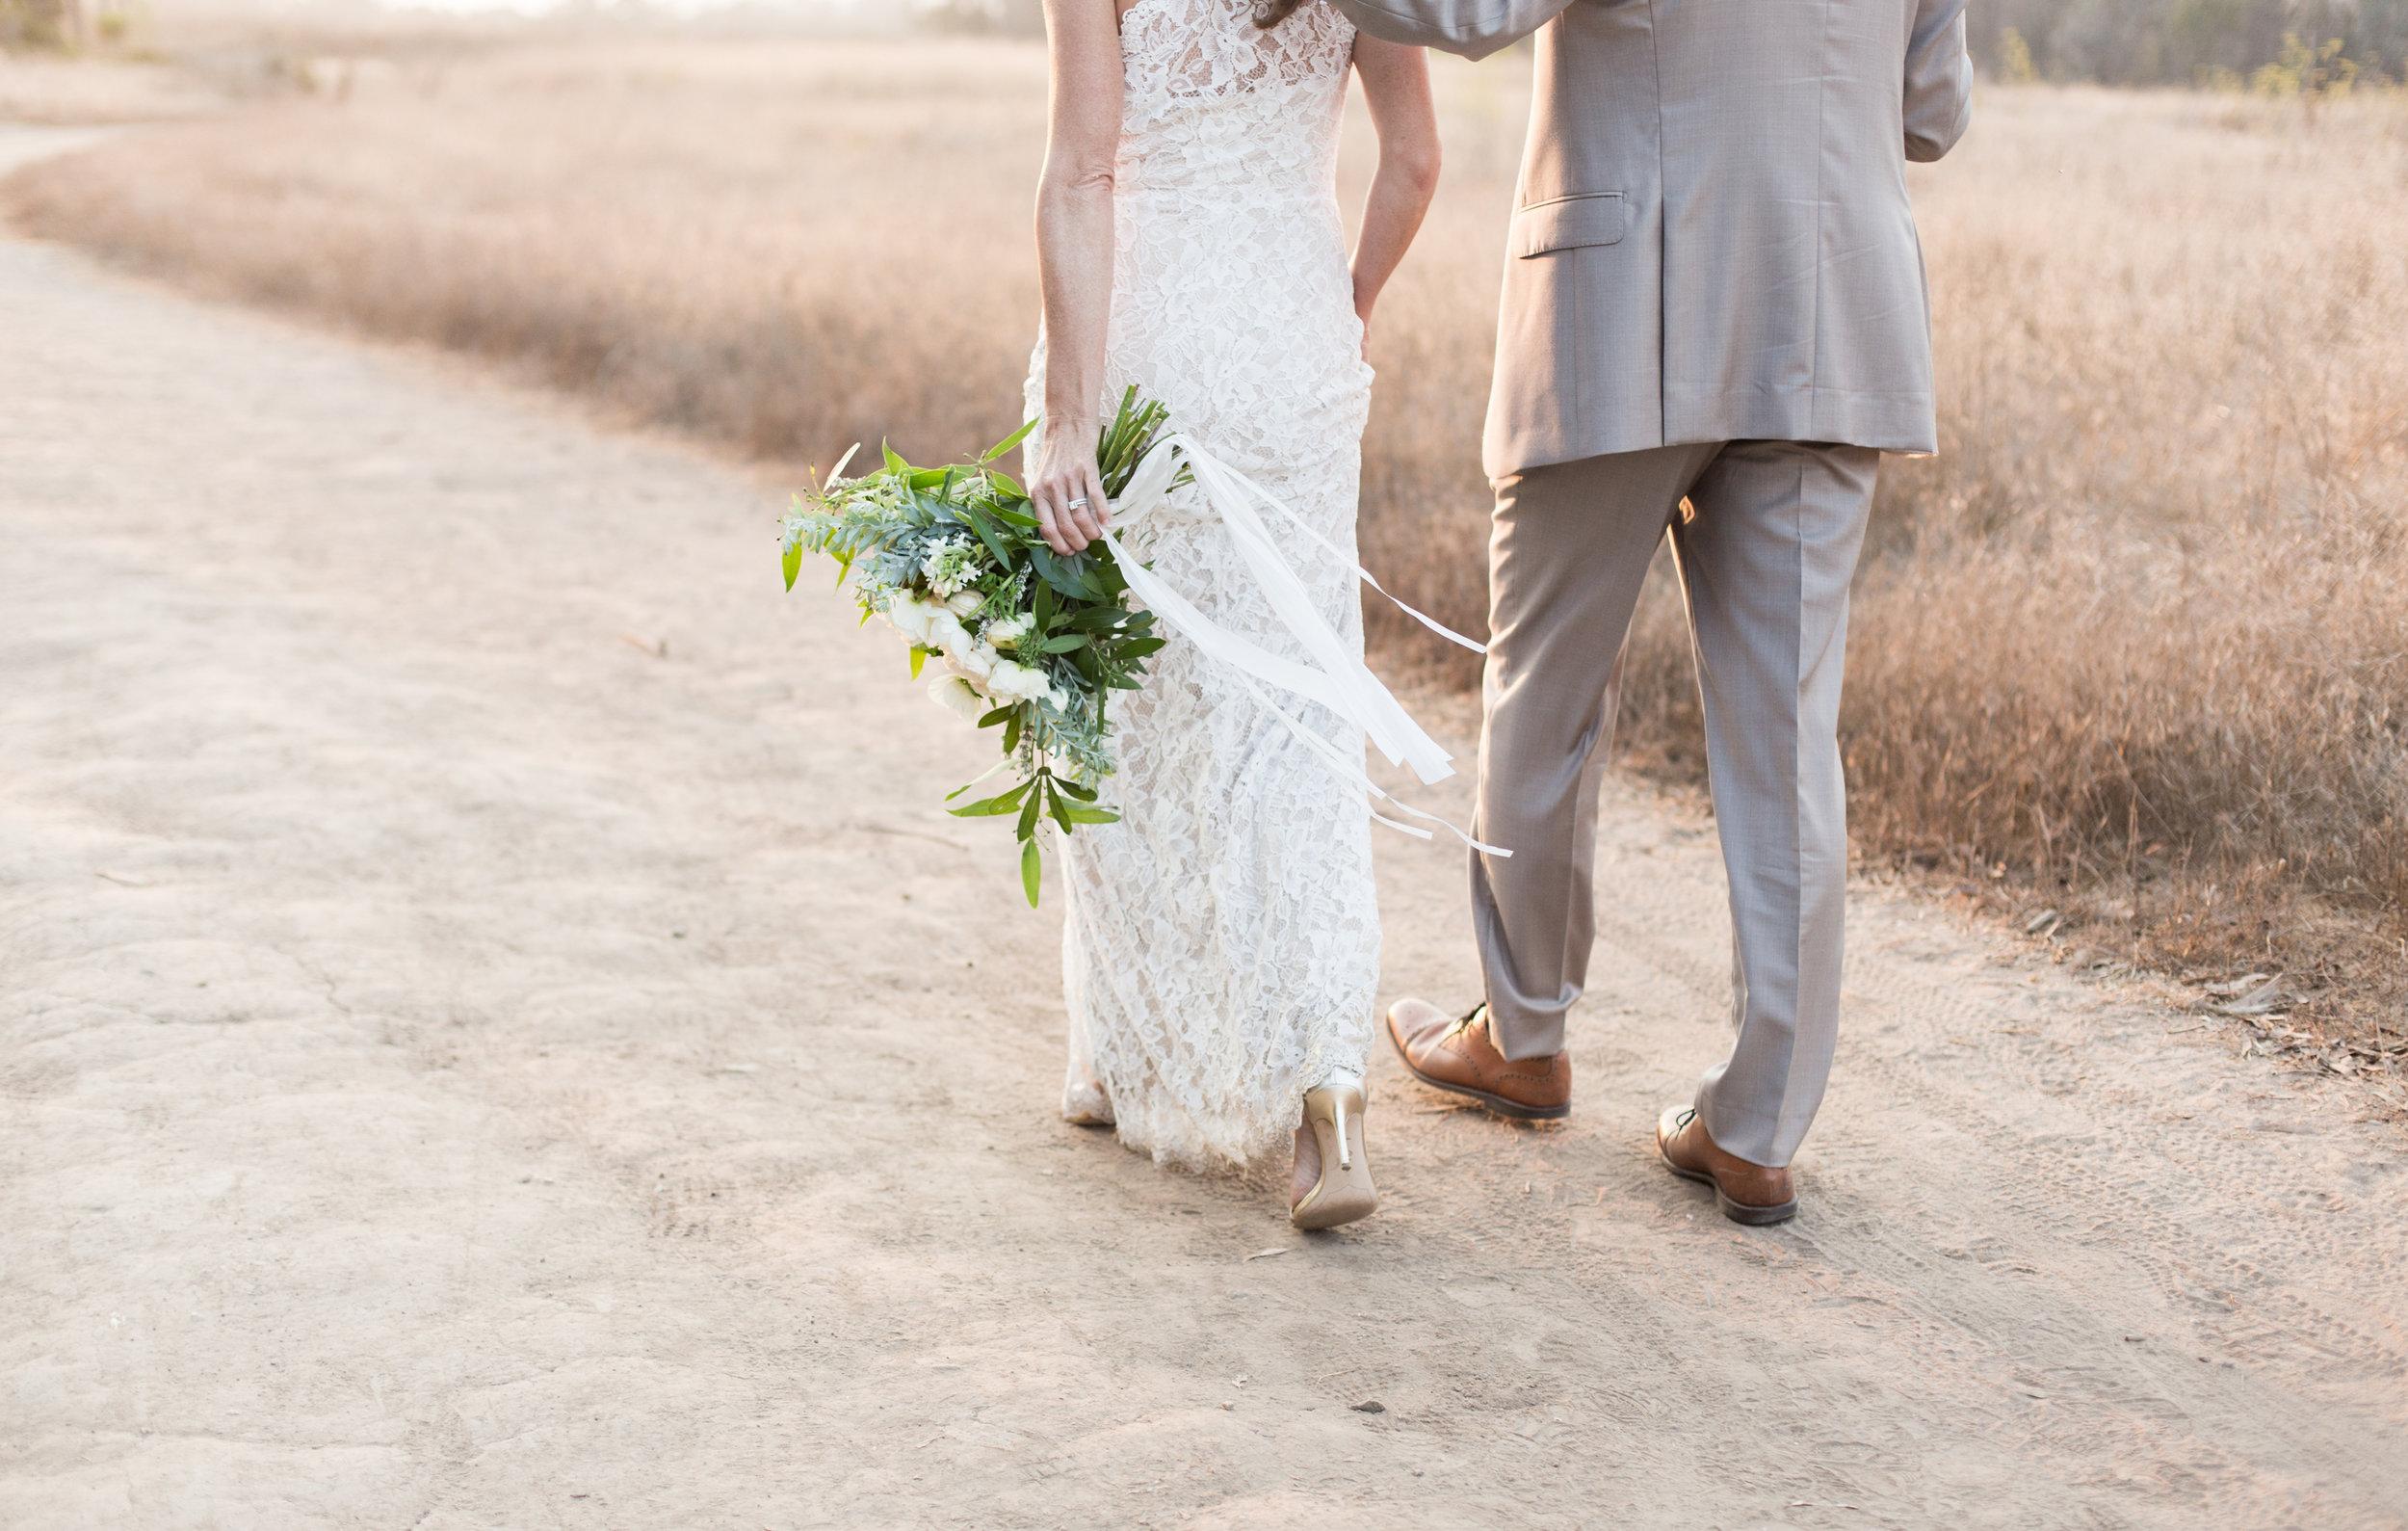 santa-barbara-elopement-elope-wedding-planner-coordinator-coordination-day-of-intimate-rustic-ellwood-bluffs-forest-beach-ocean-view-green-white-event (15).jpg